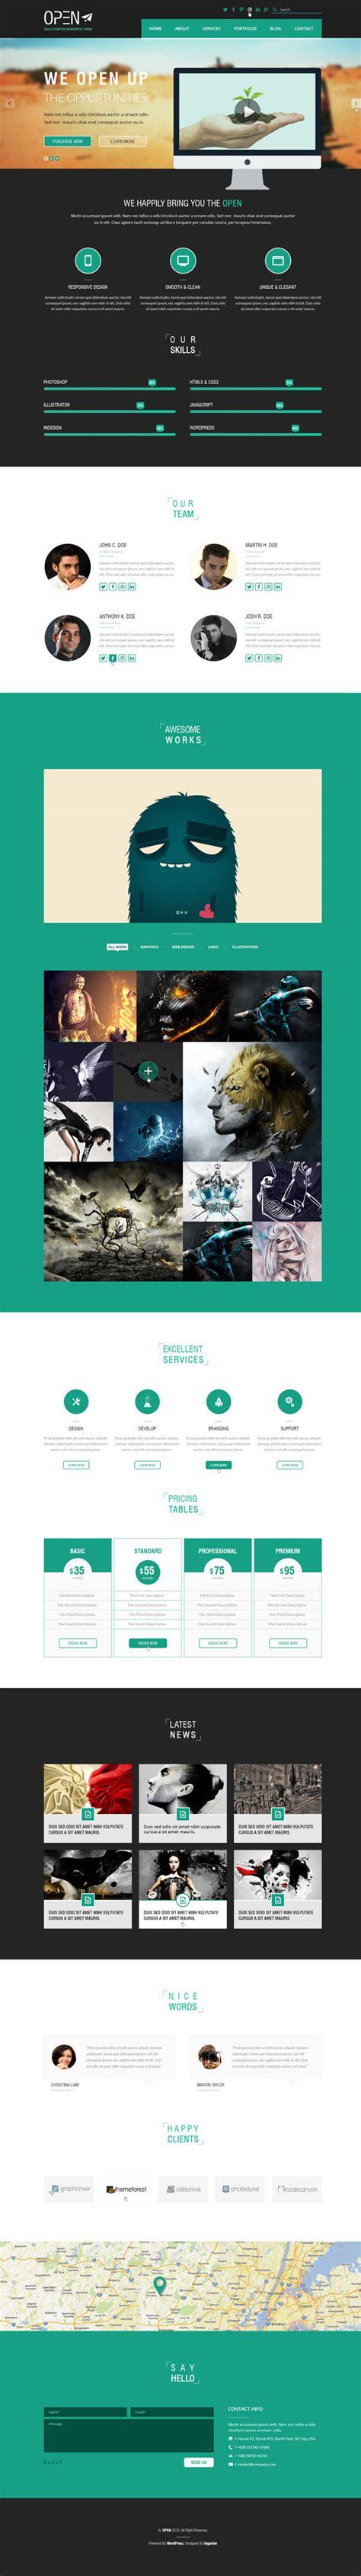 Modern Responsive Html5 Css3 Website Templates Design Graphic Design Junction Modern Responsive Website Templates